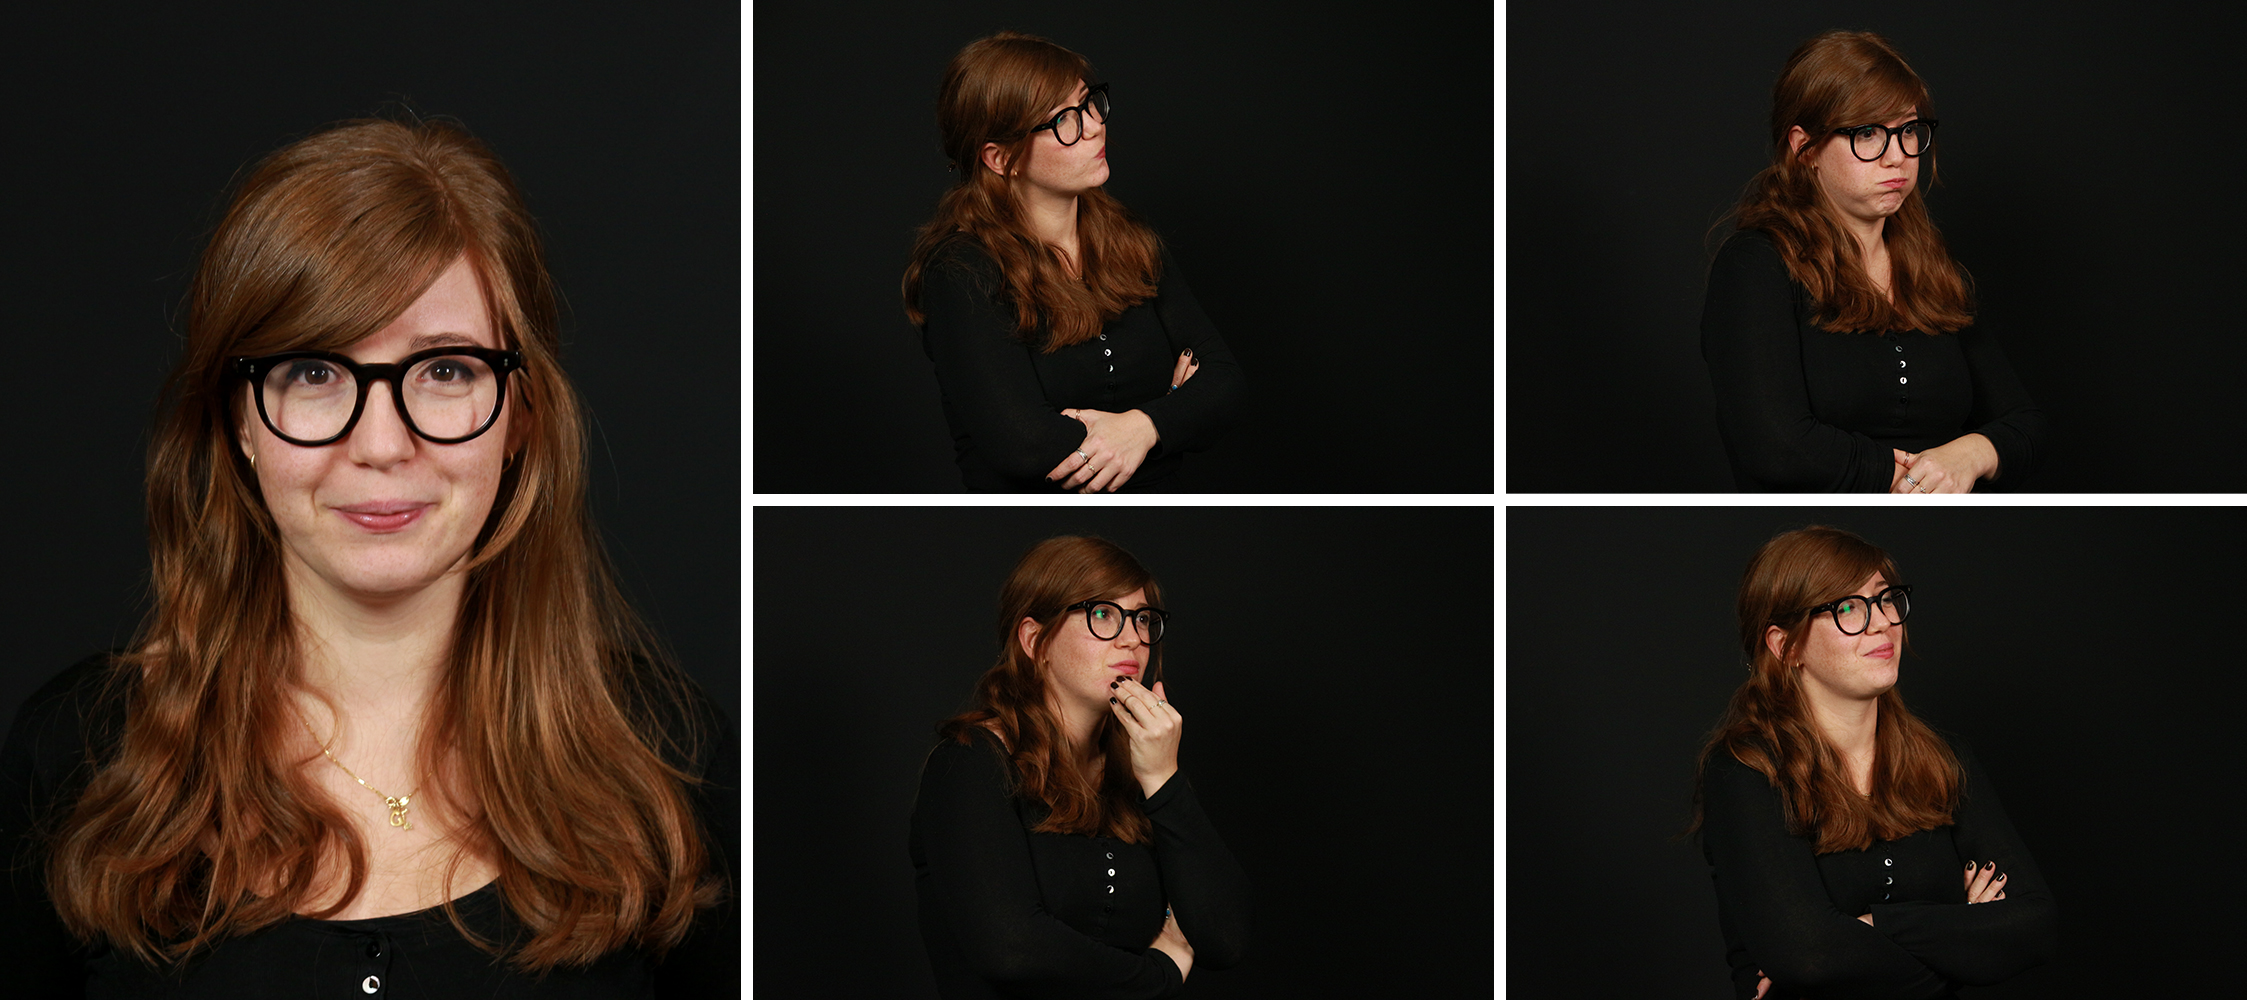 Vorstellung Gisella Sapina Febrero, innosabi